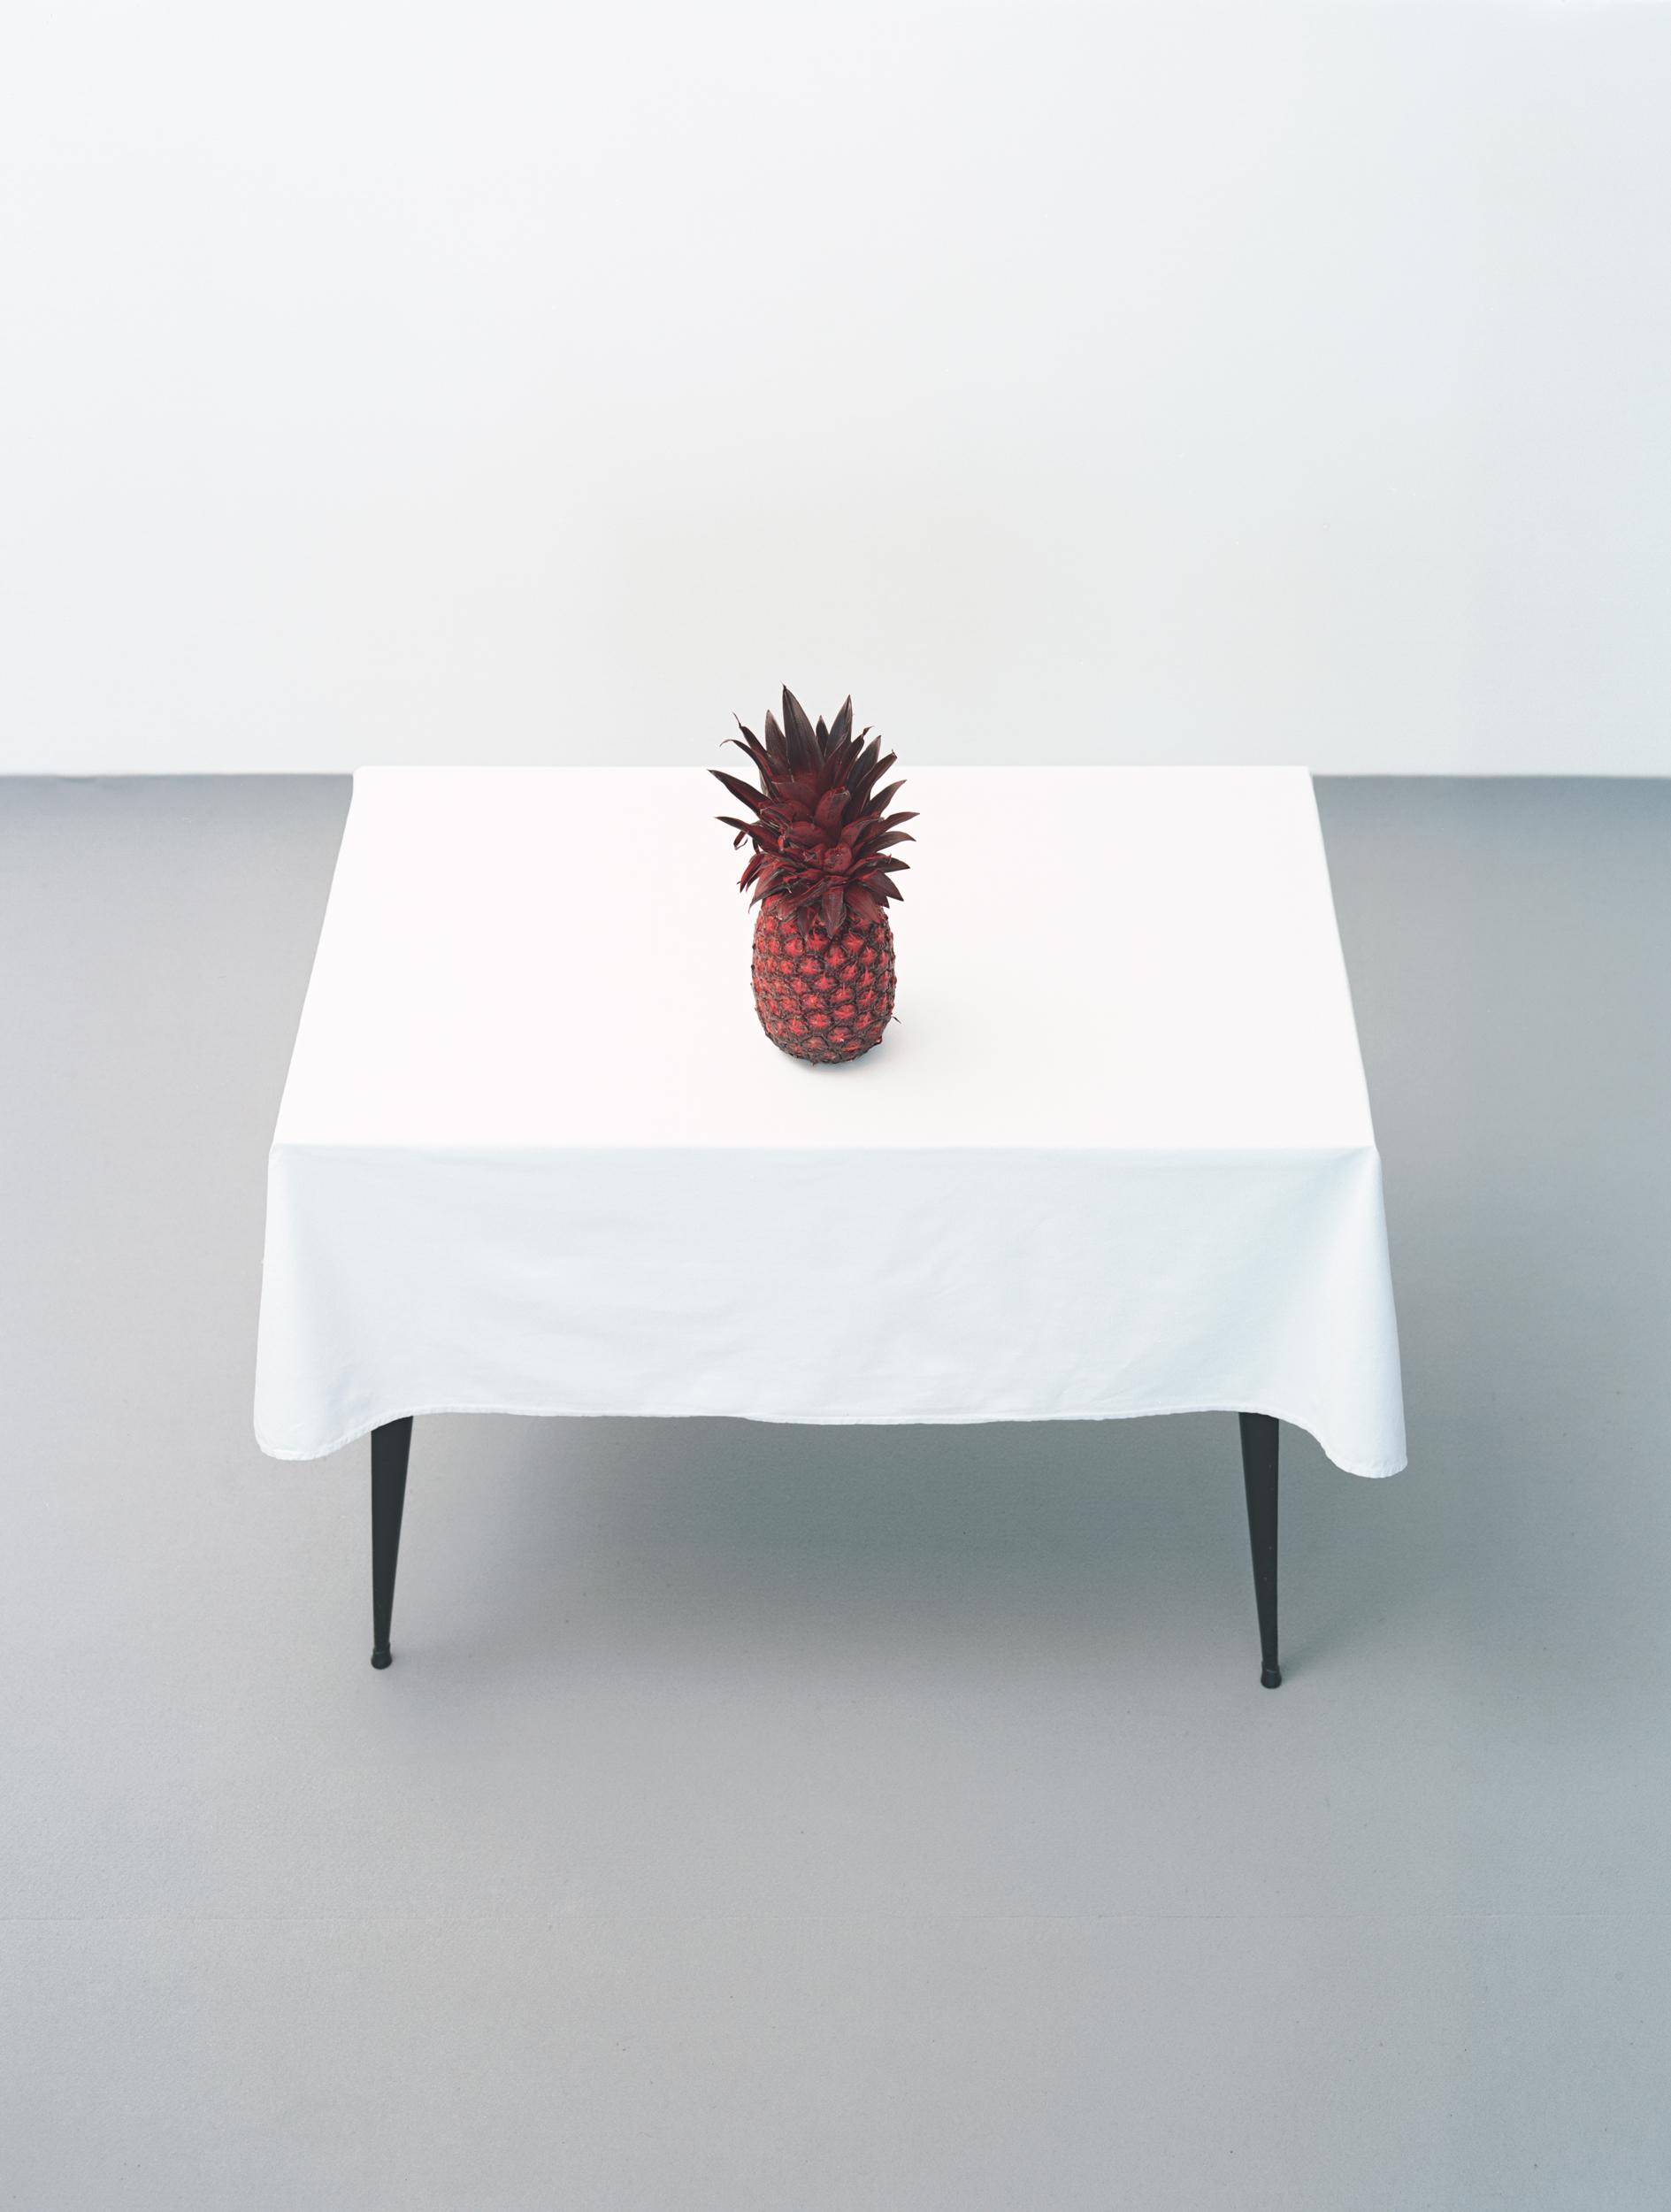 Carlo Benvenuto, Untitled, 2016, C-print, cm 225x170